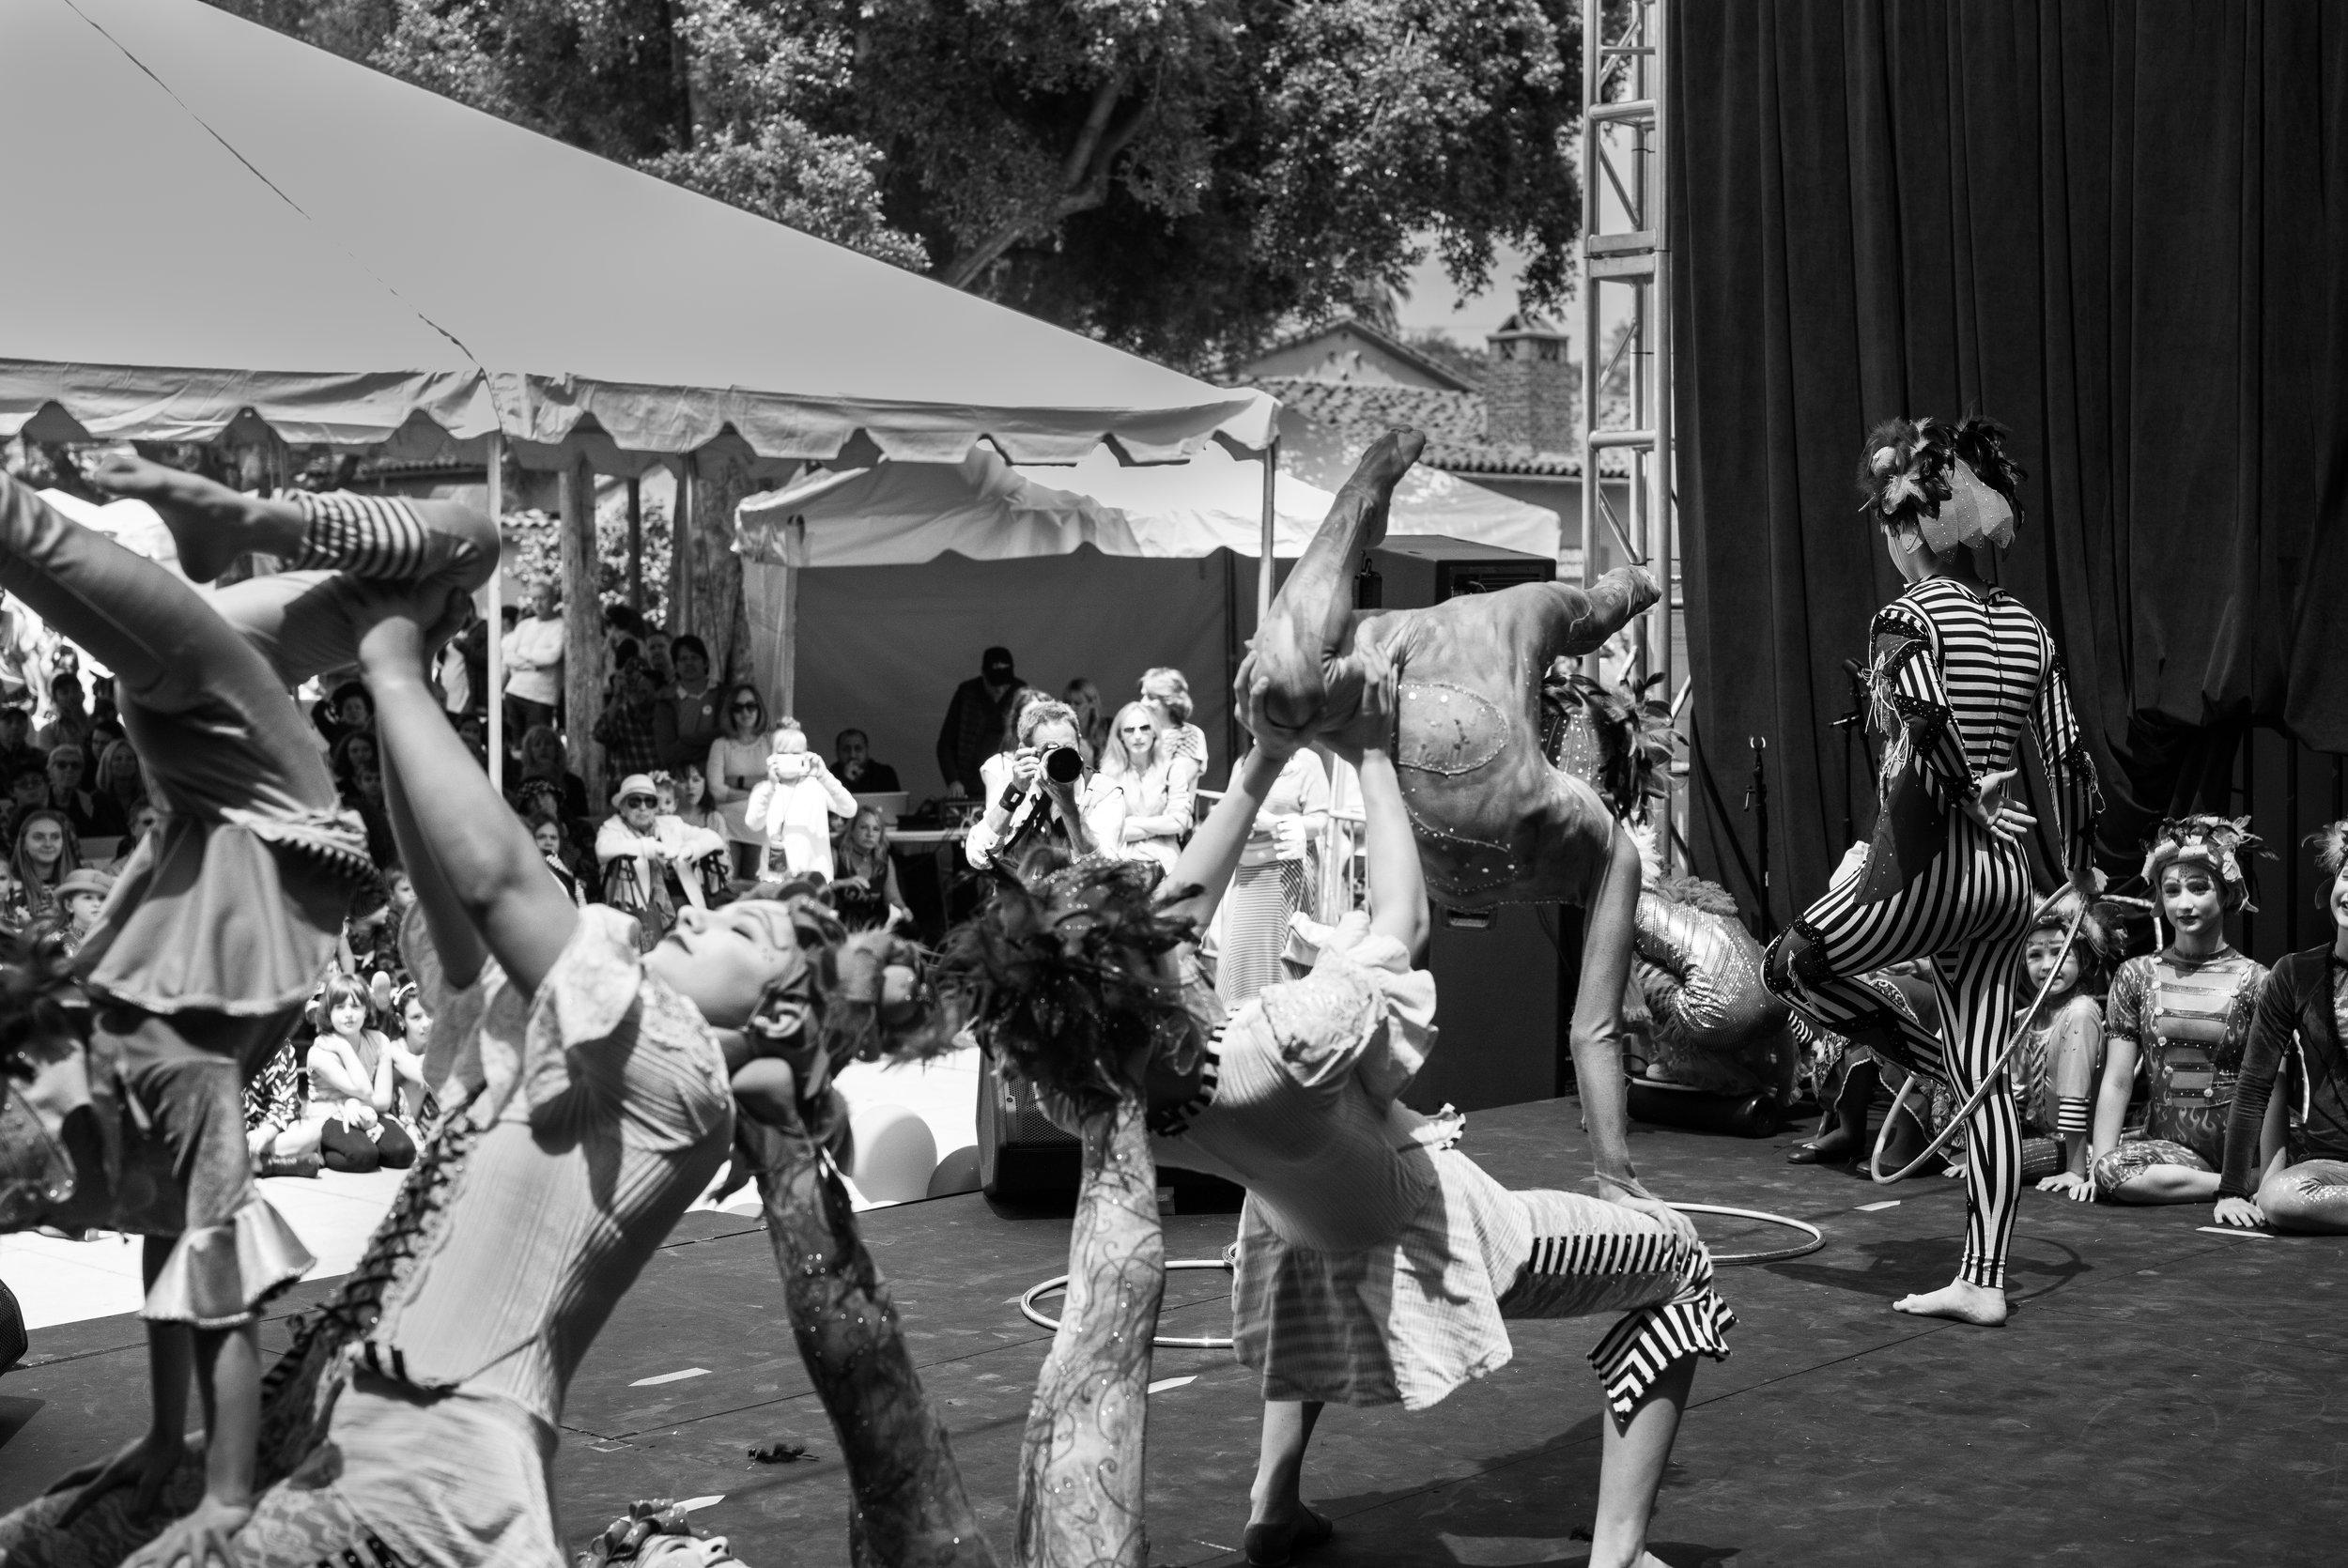 2018_May_2018-5-LPC_Russian_FestivalWest_Hollywood_465.jpg